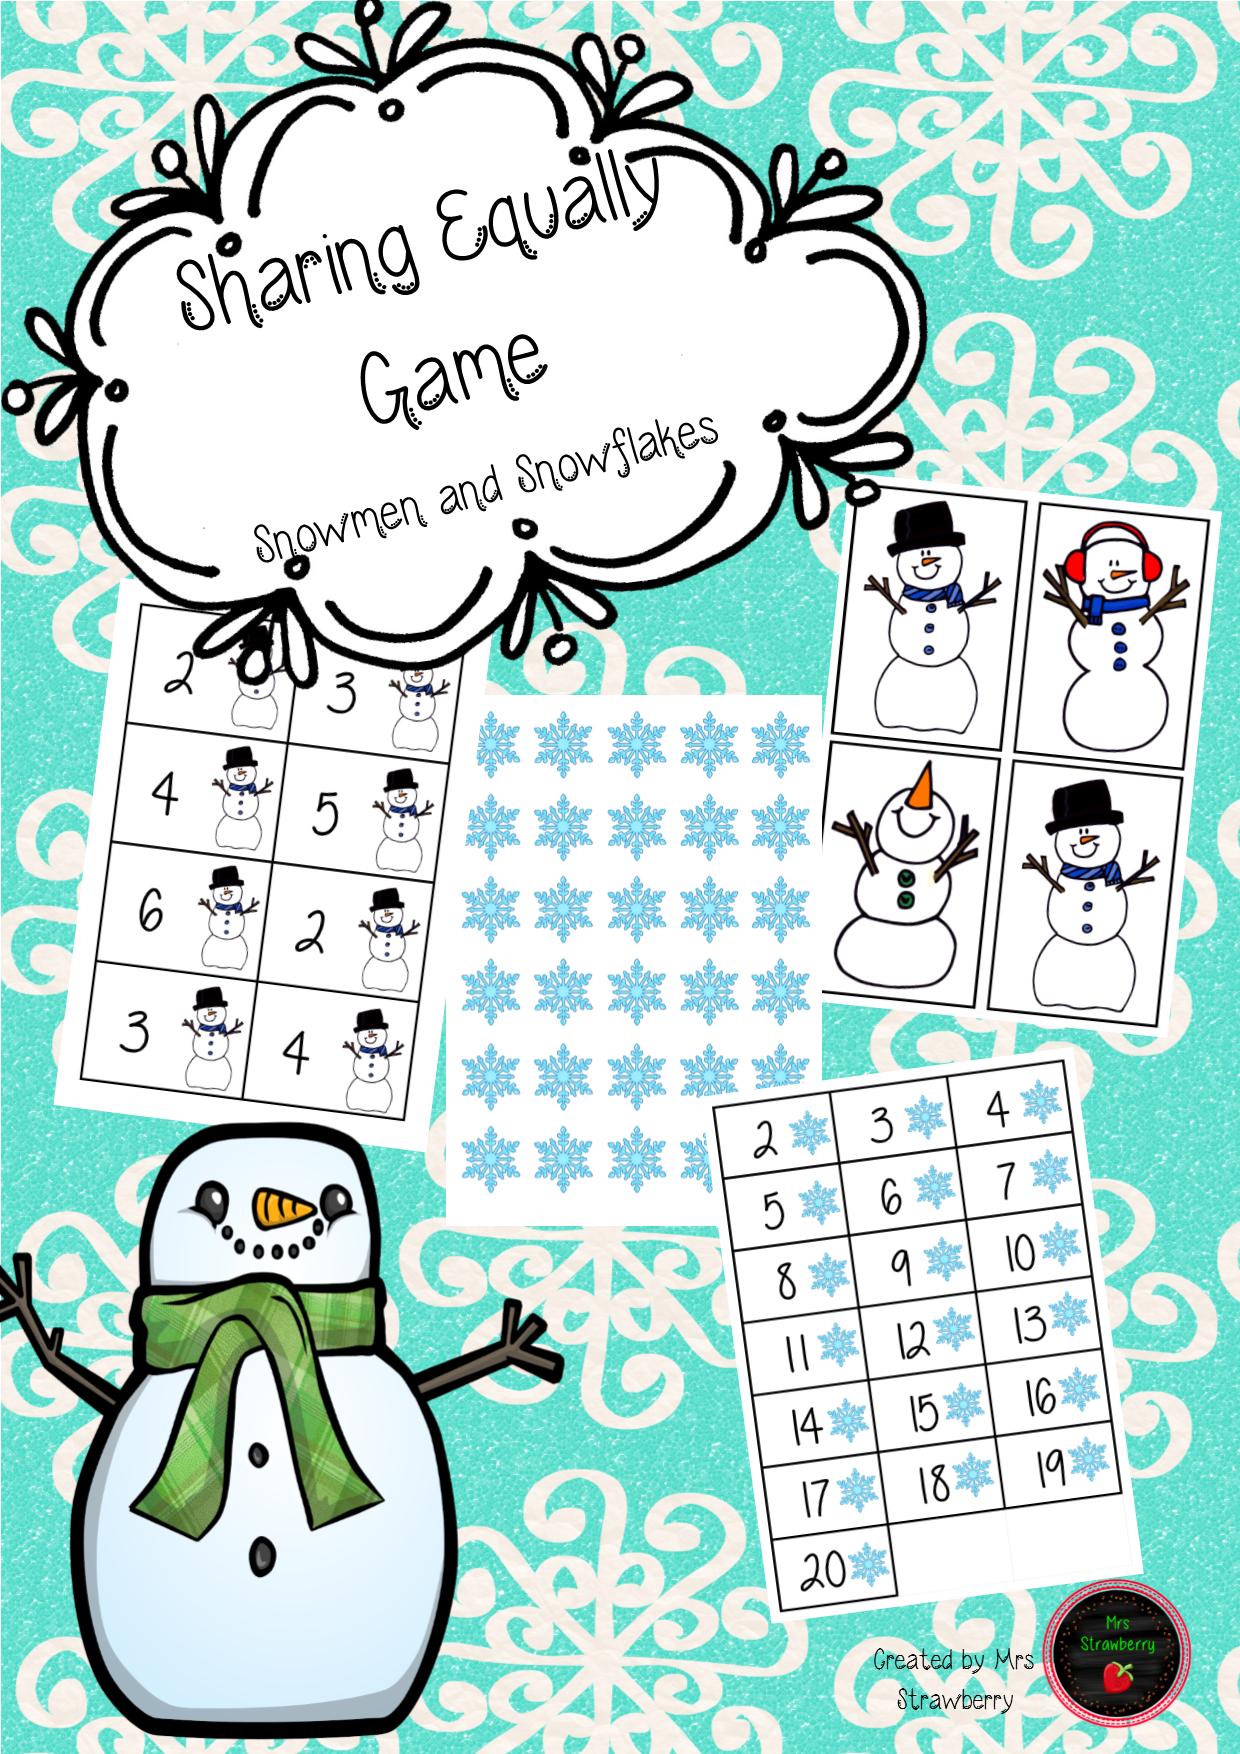 Christmas Sharing Equally Game - Snowmen and Snowflakes | DBT ...